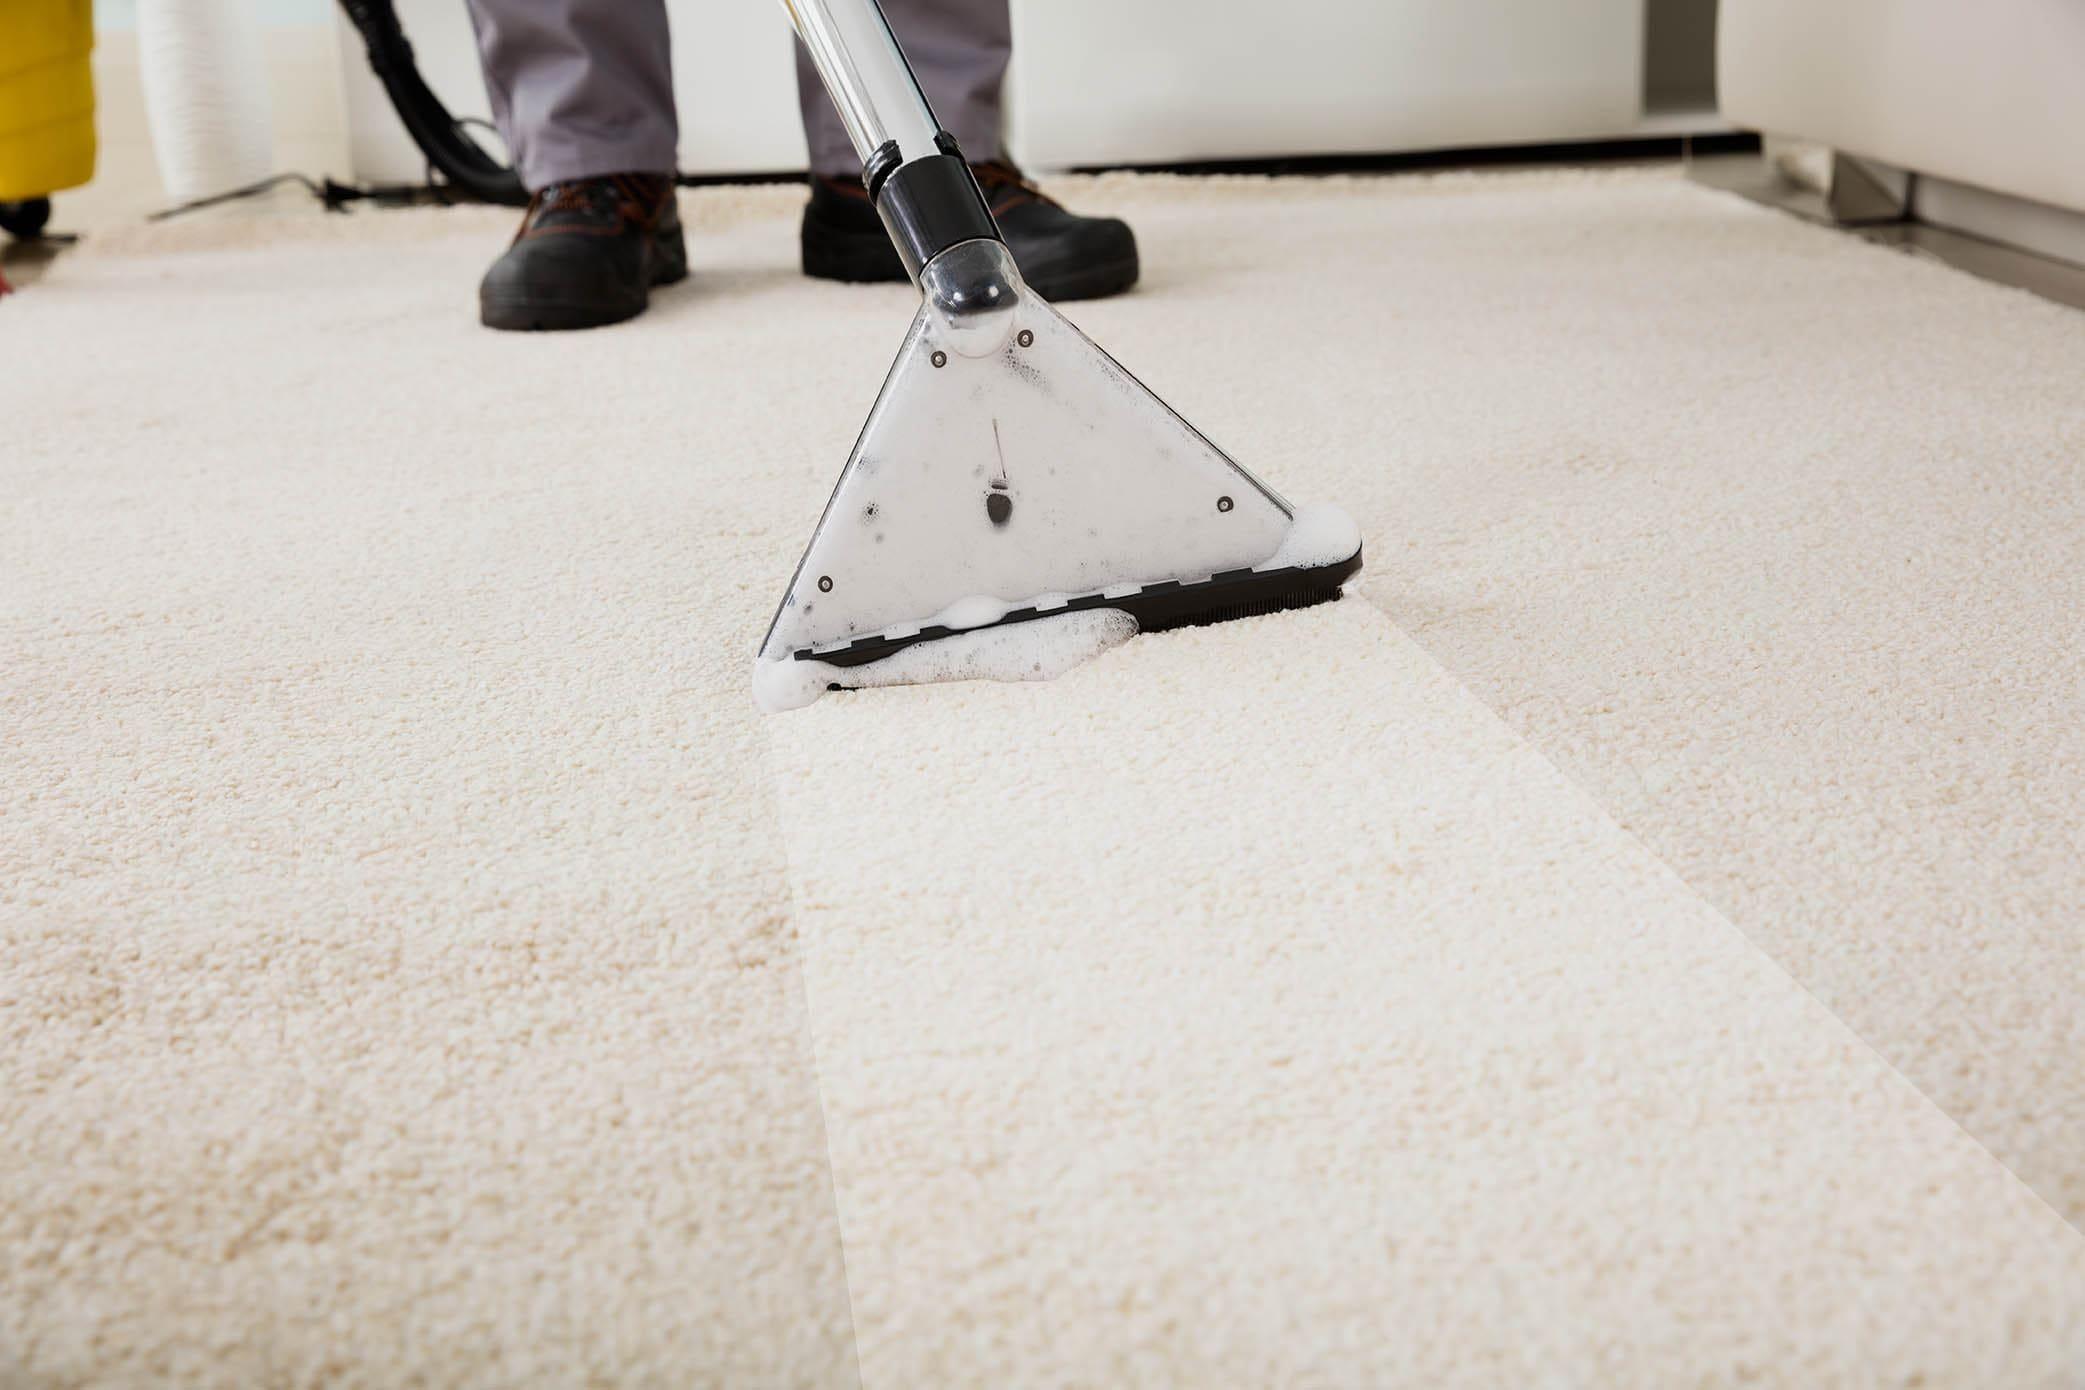 person vacuuming carpet